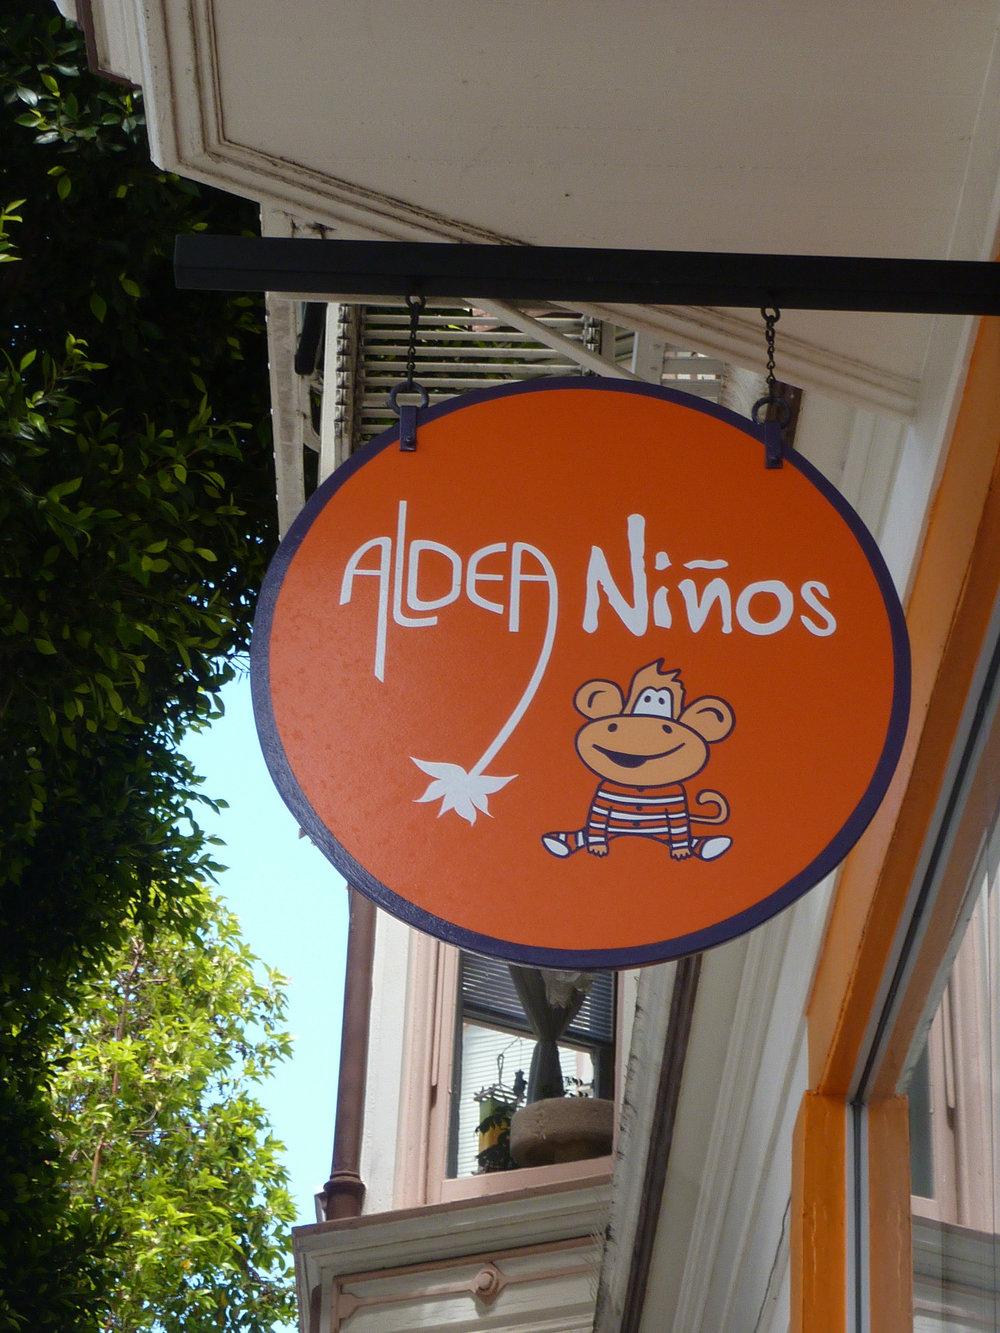 HAND-aldea-ninos_6057426090_o.jpg